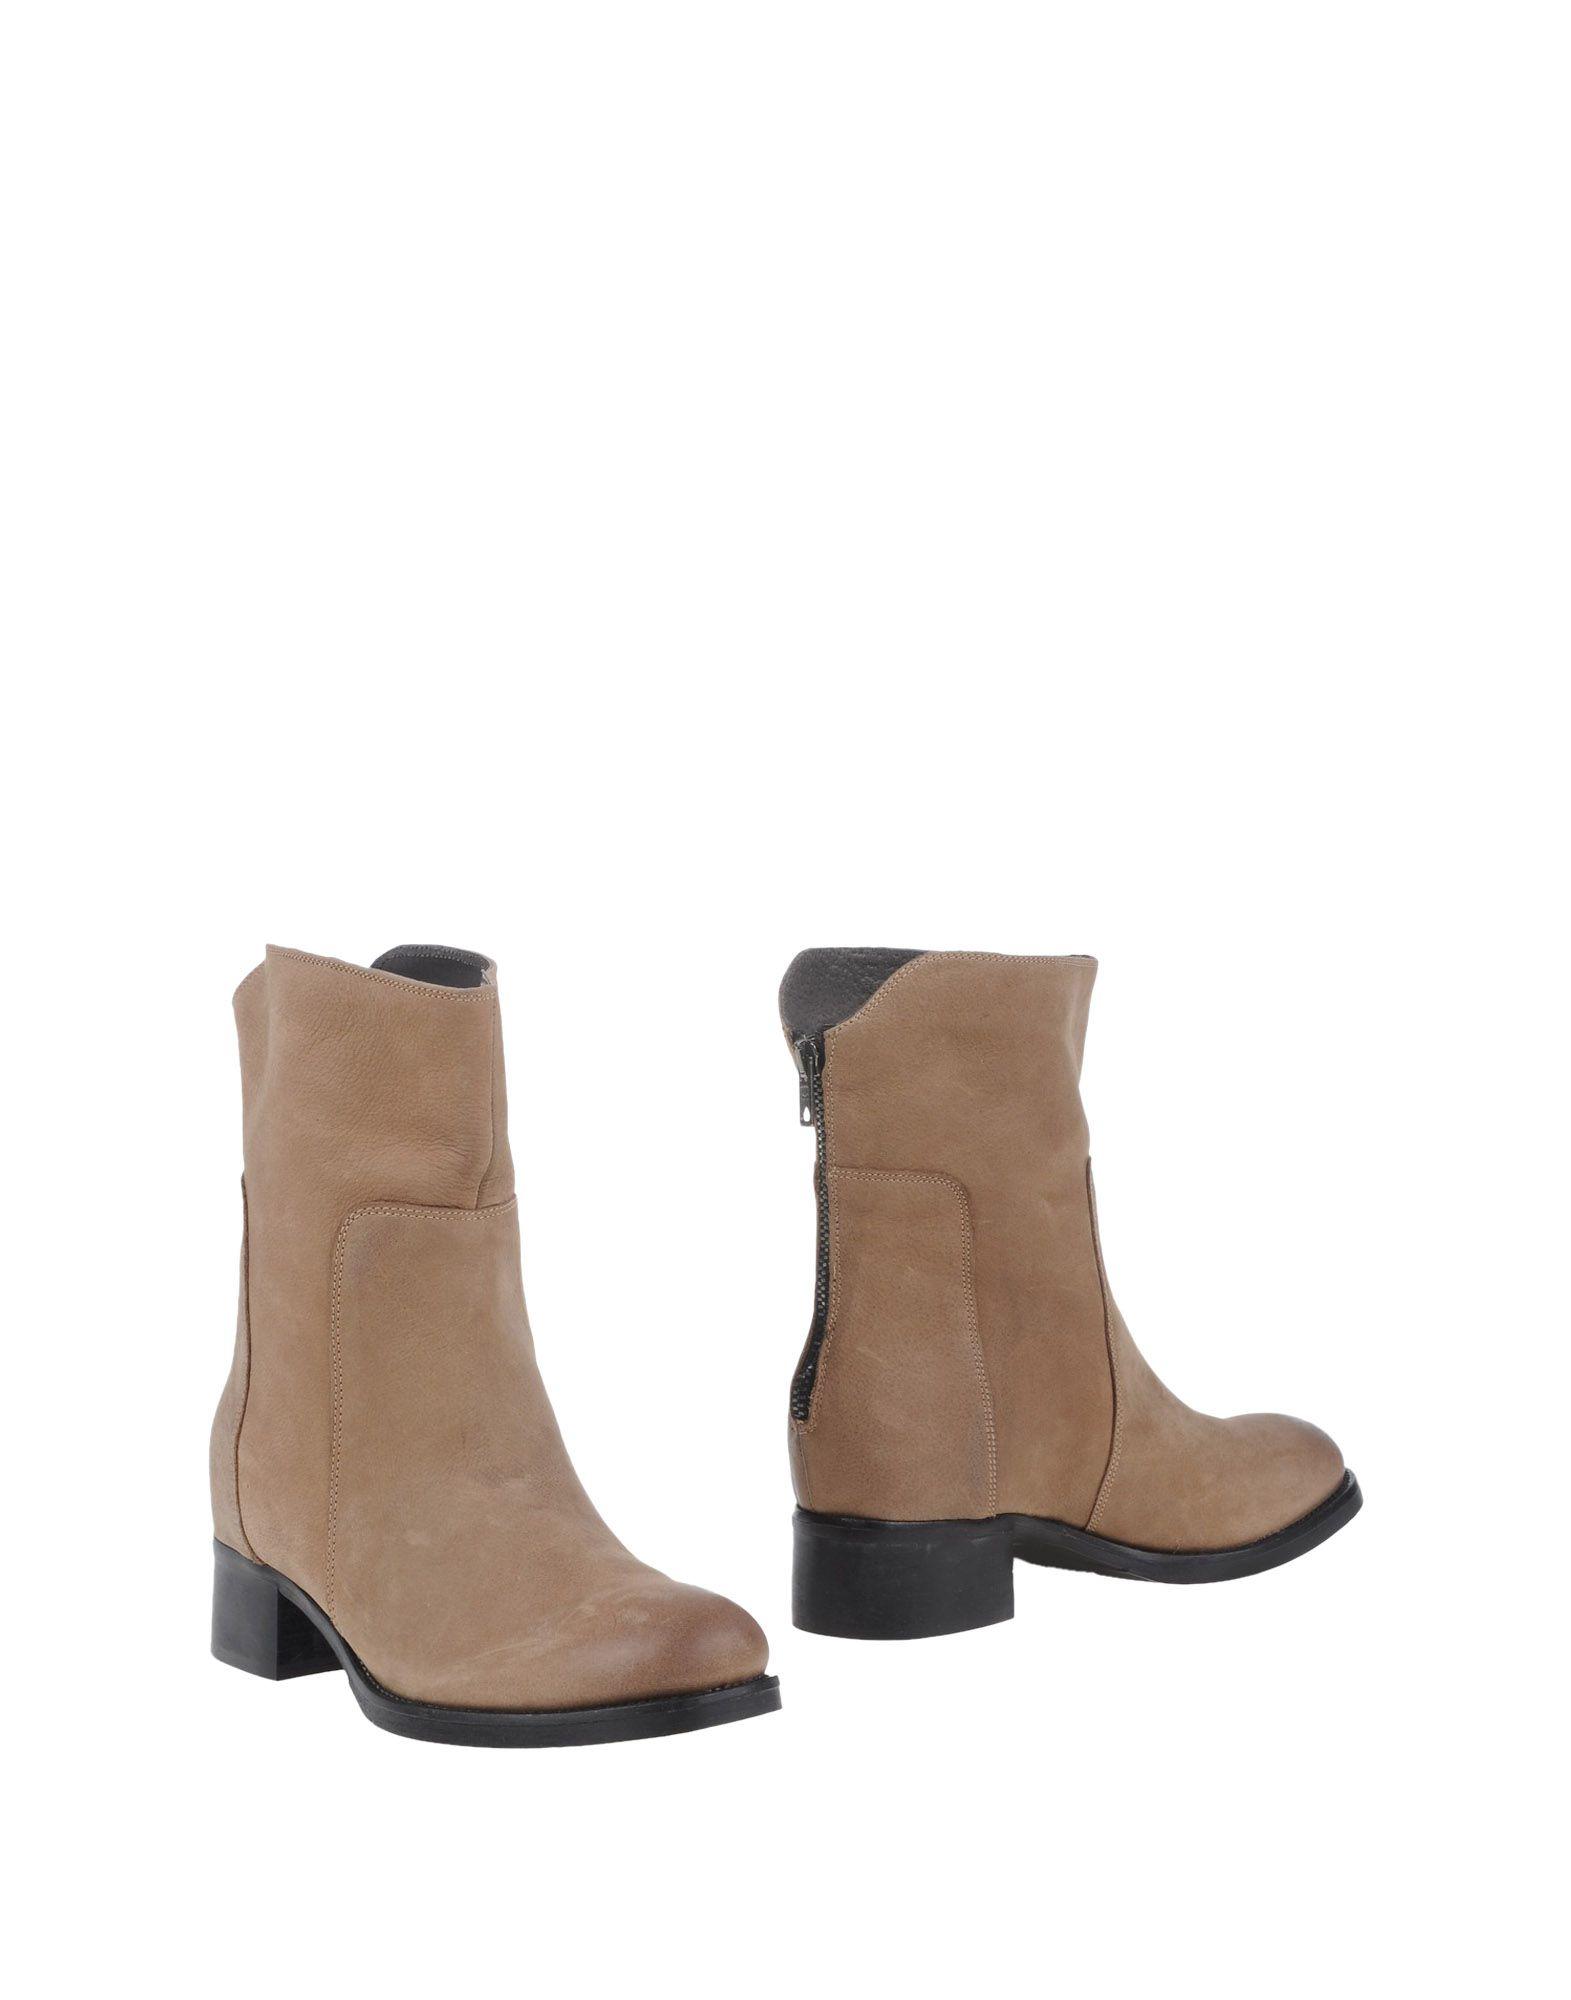 Gut um billige Schuhe zu tragenPaola 11017104FS Ferri Stiefelette Damen  11017104FS tragenPaola d0bee6